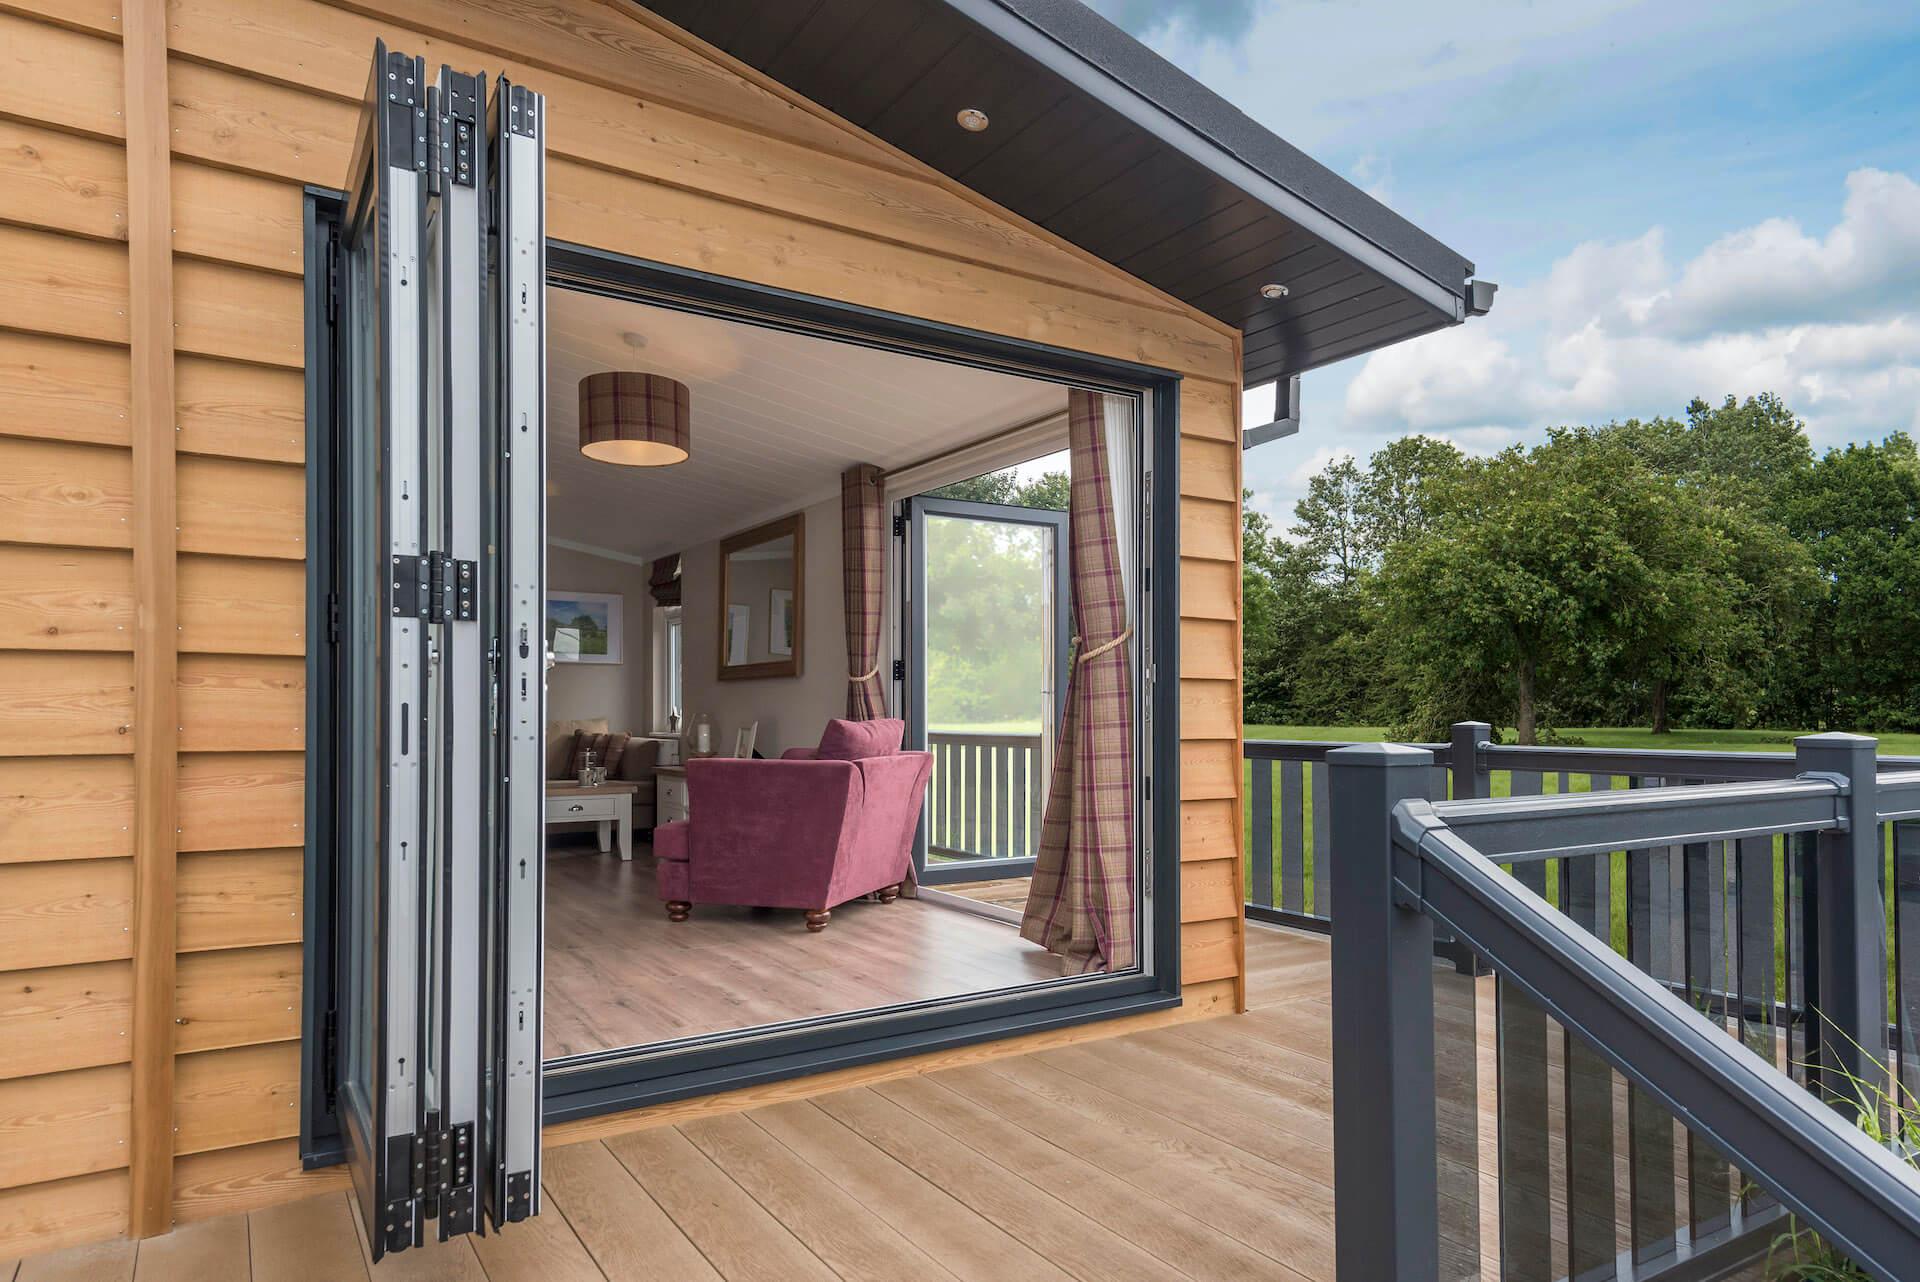 Wessex-Allure-Luxury-Lodge-Bi-folds